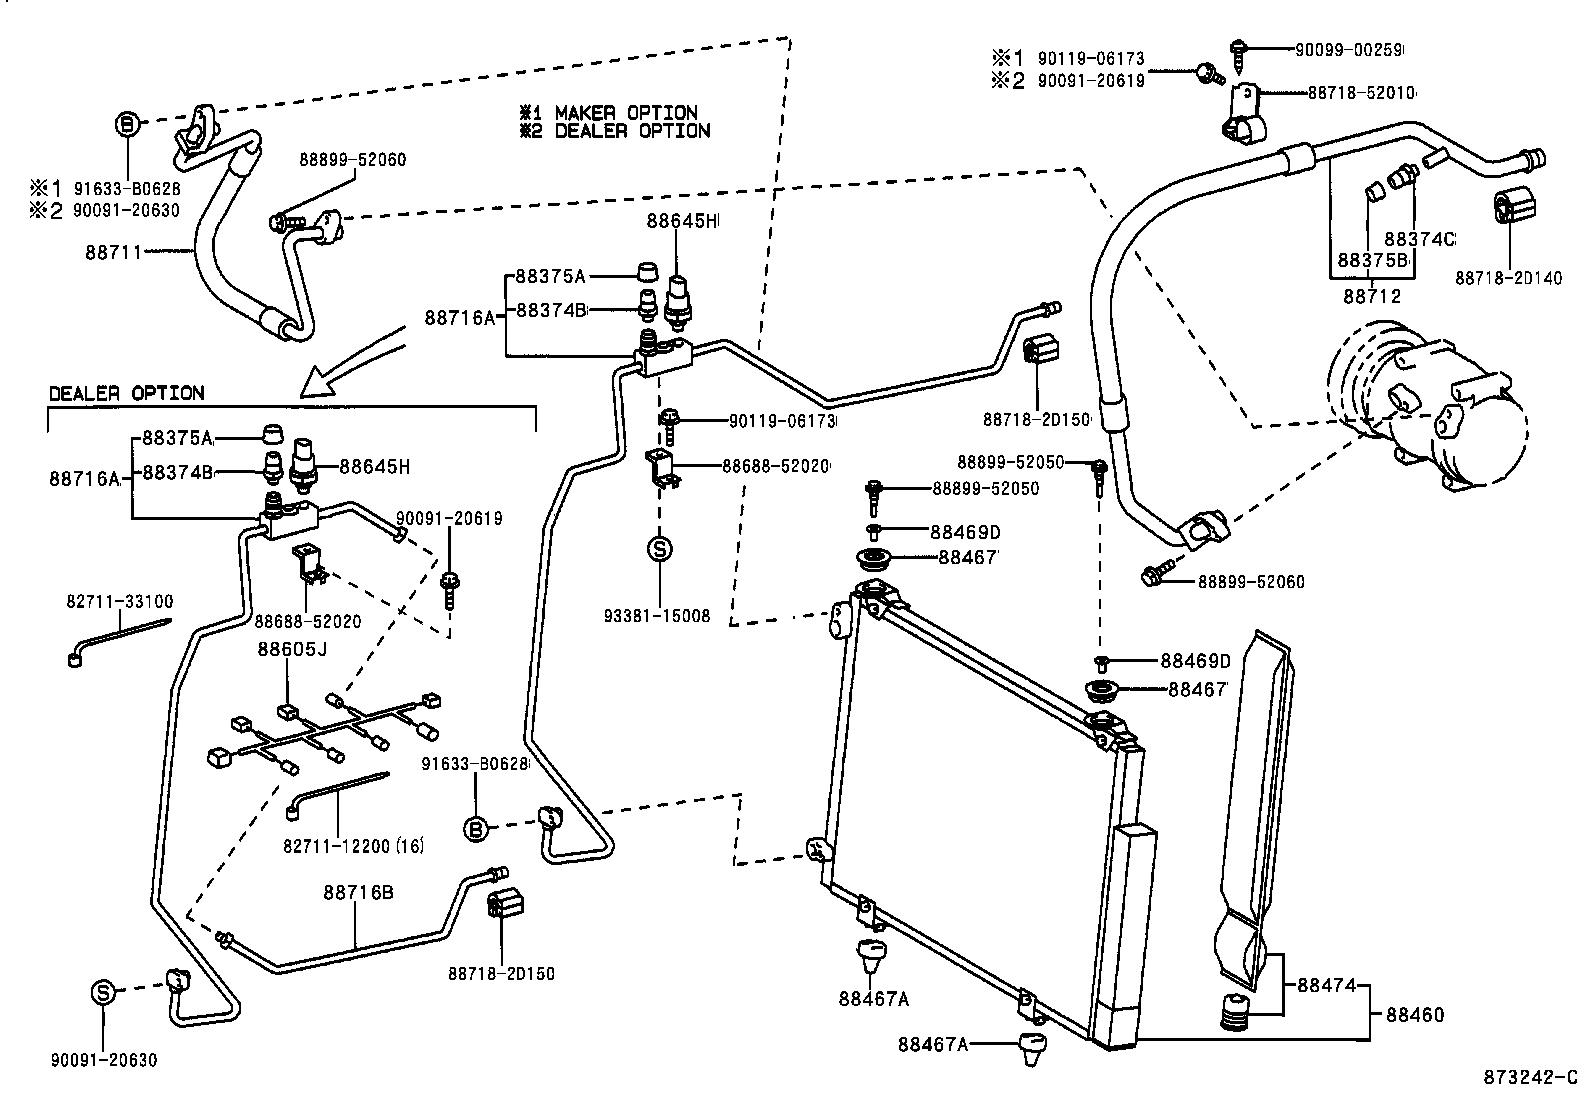 2003 Toyota Rav4 Fuse Box Diagram  Toyota  Wiring Diagram